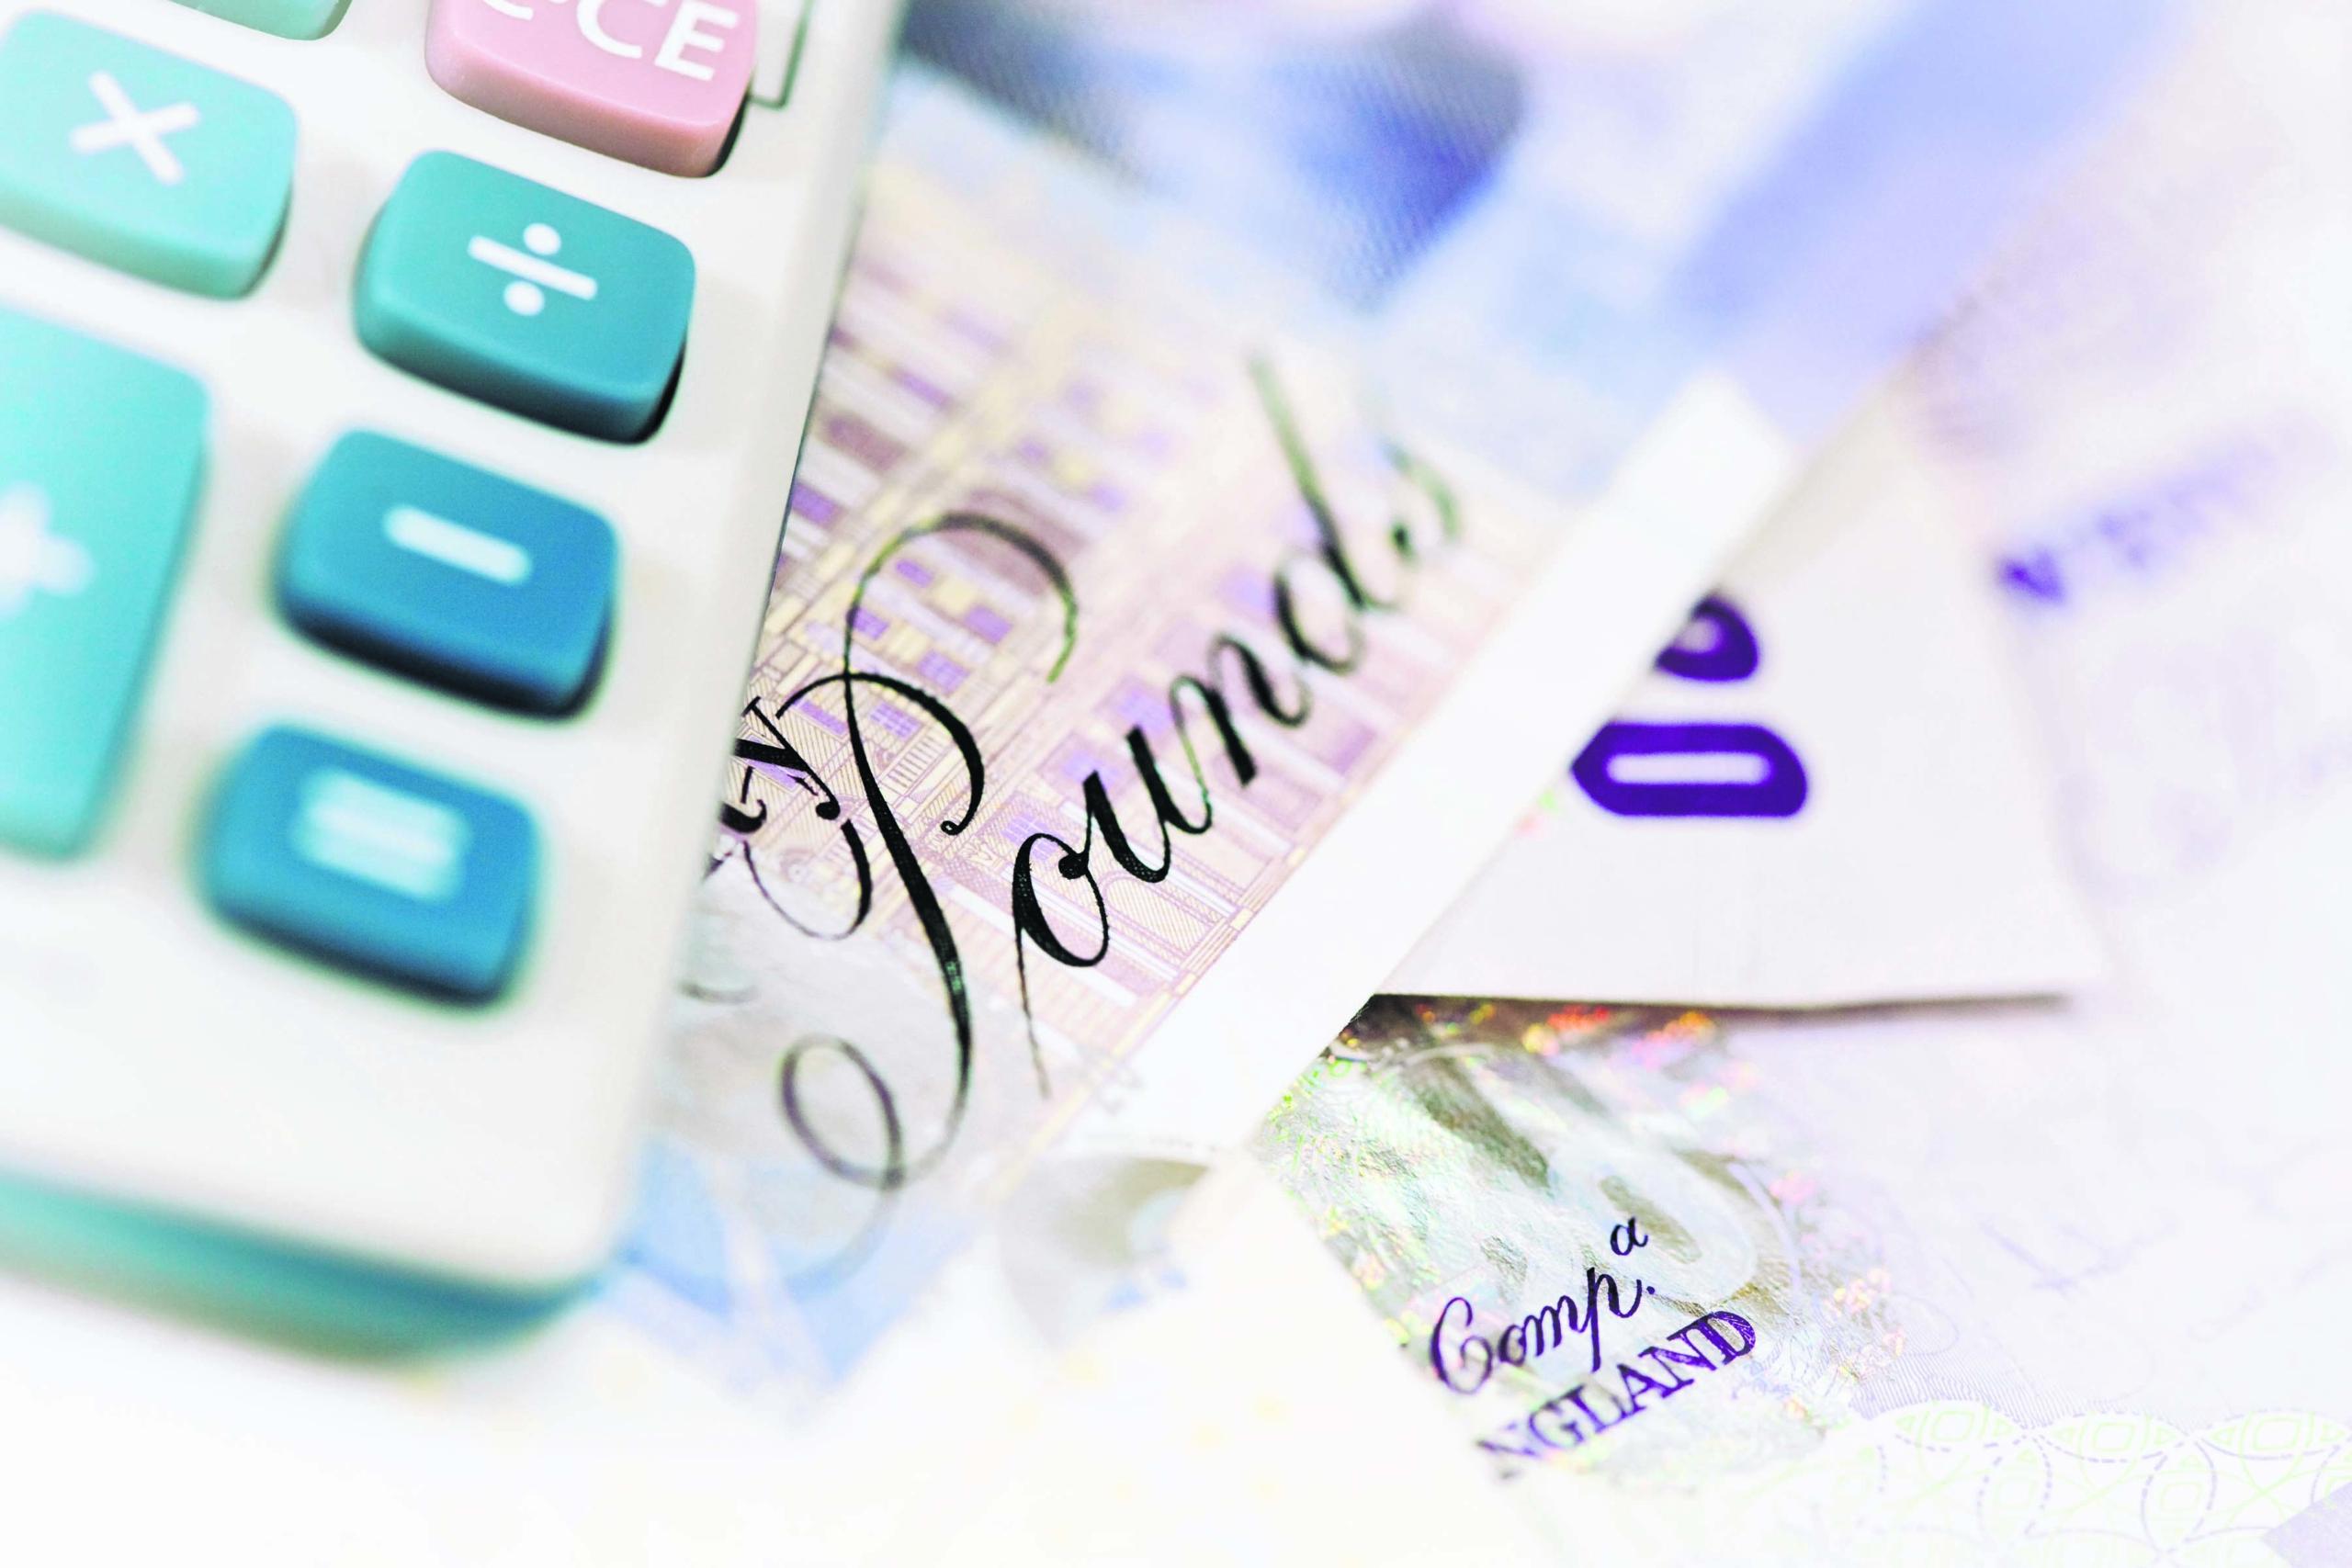 An image of twenty pound notes